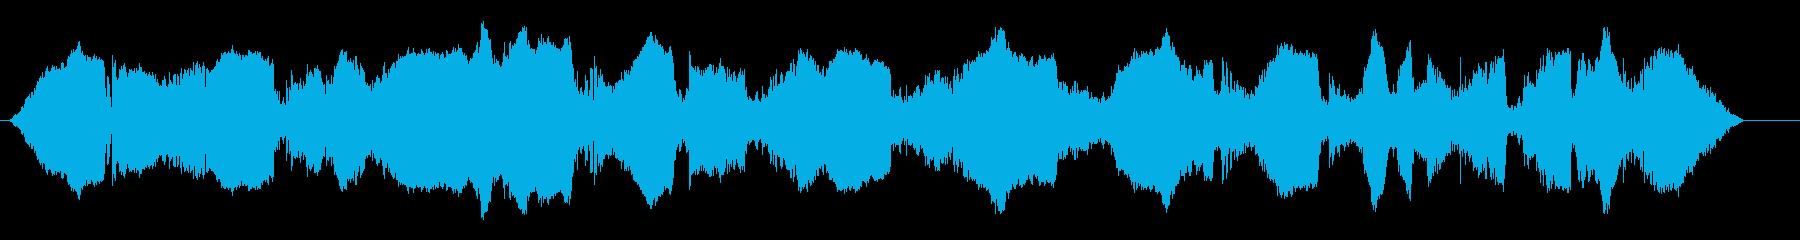 FIA GTカー;アウェイ(数)ア...の再生済みの波形